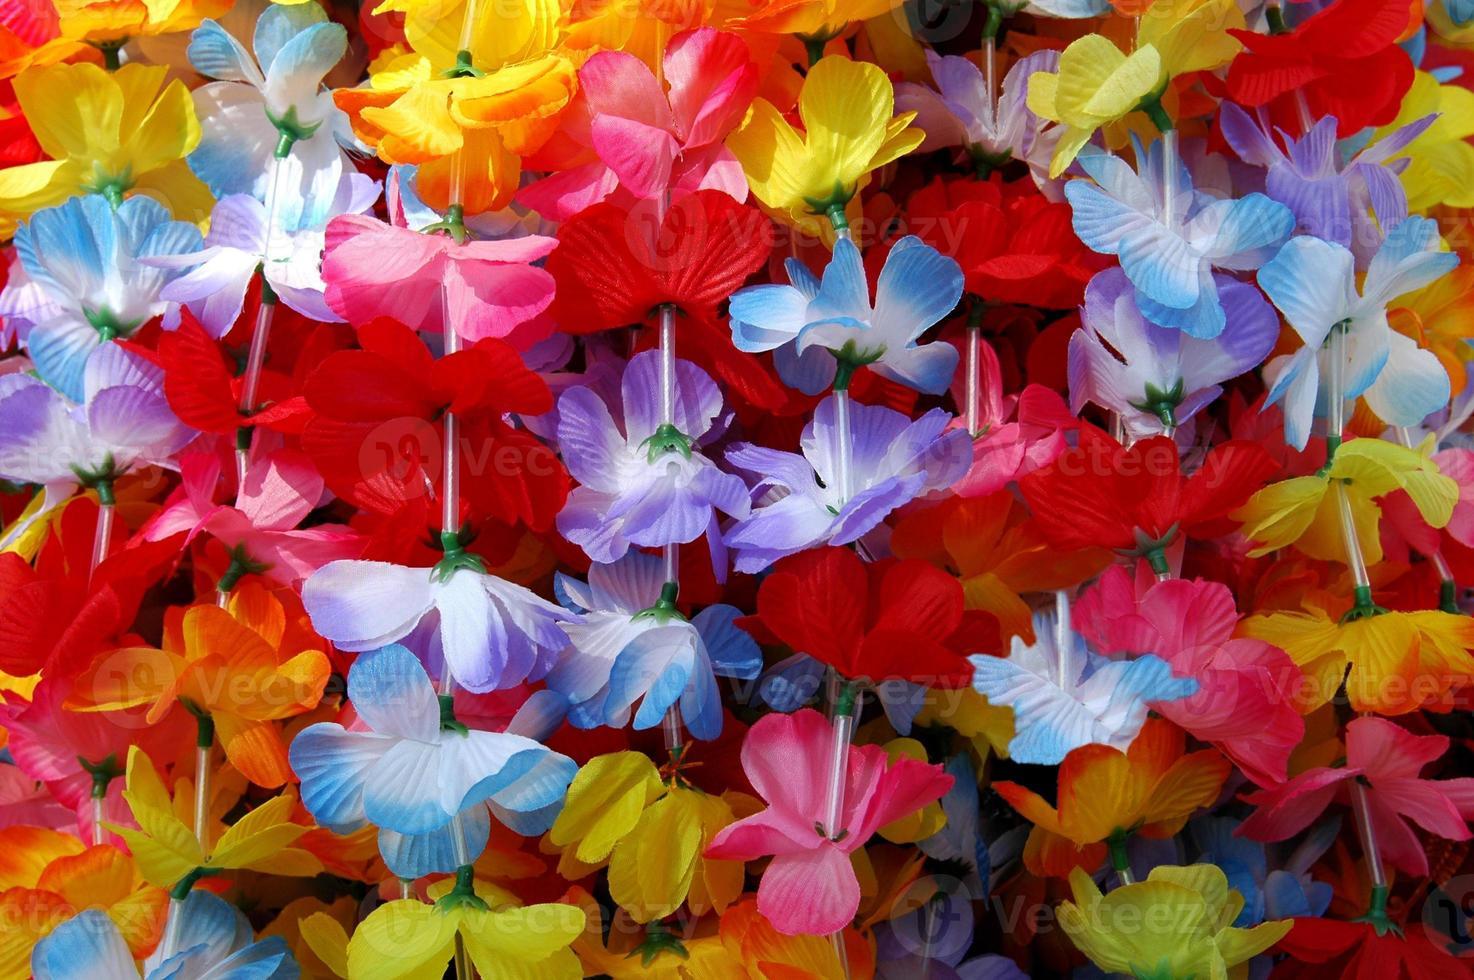 Colorful Leis photo